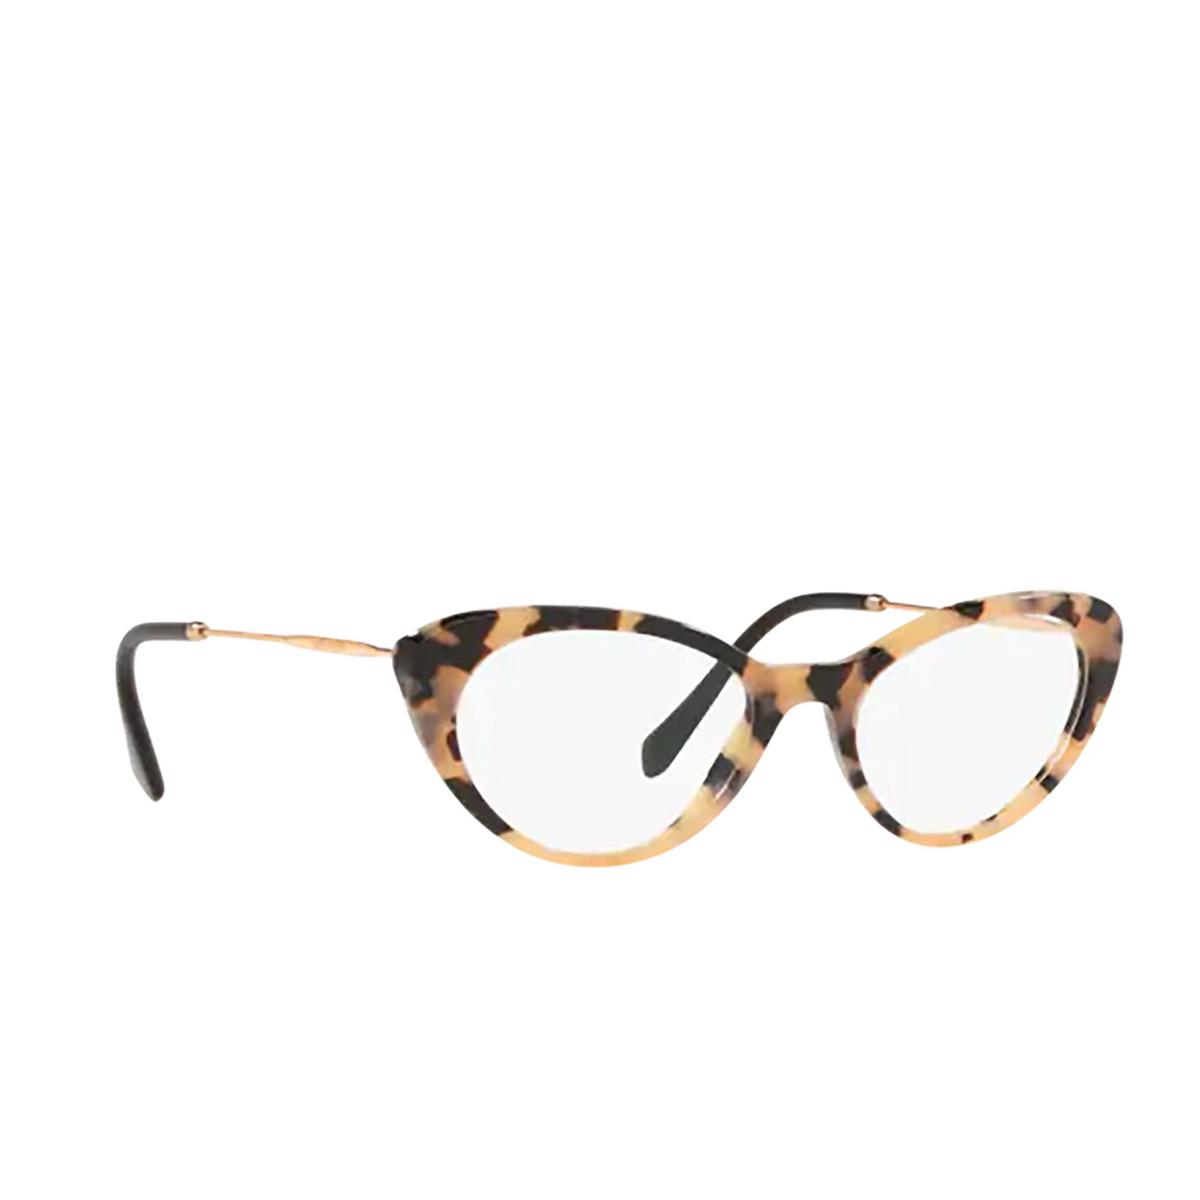 Miu Miu® Cat-eye Eyeglasses: MU 05RV color Pink Havana 07D1O1 - three-quarters view.